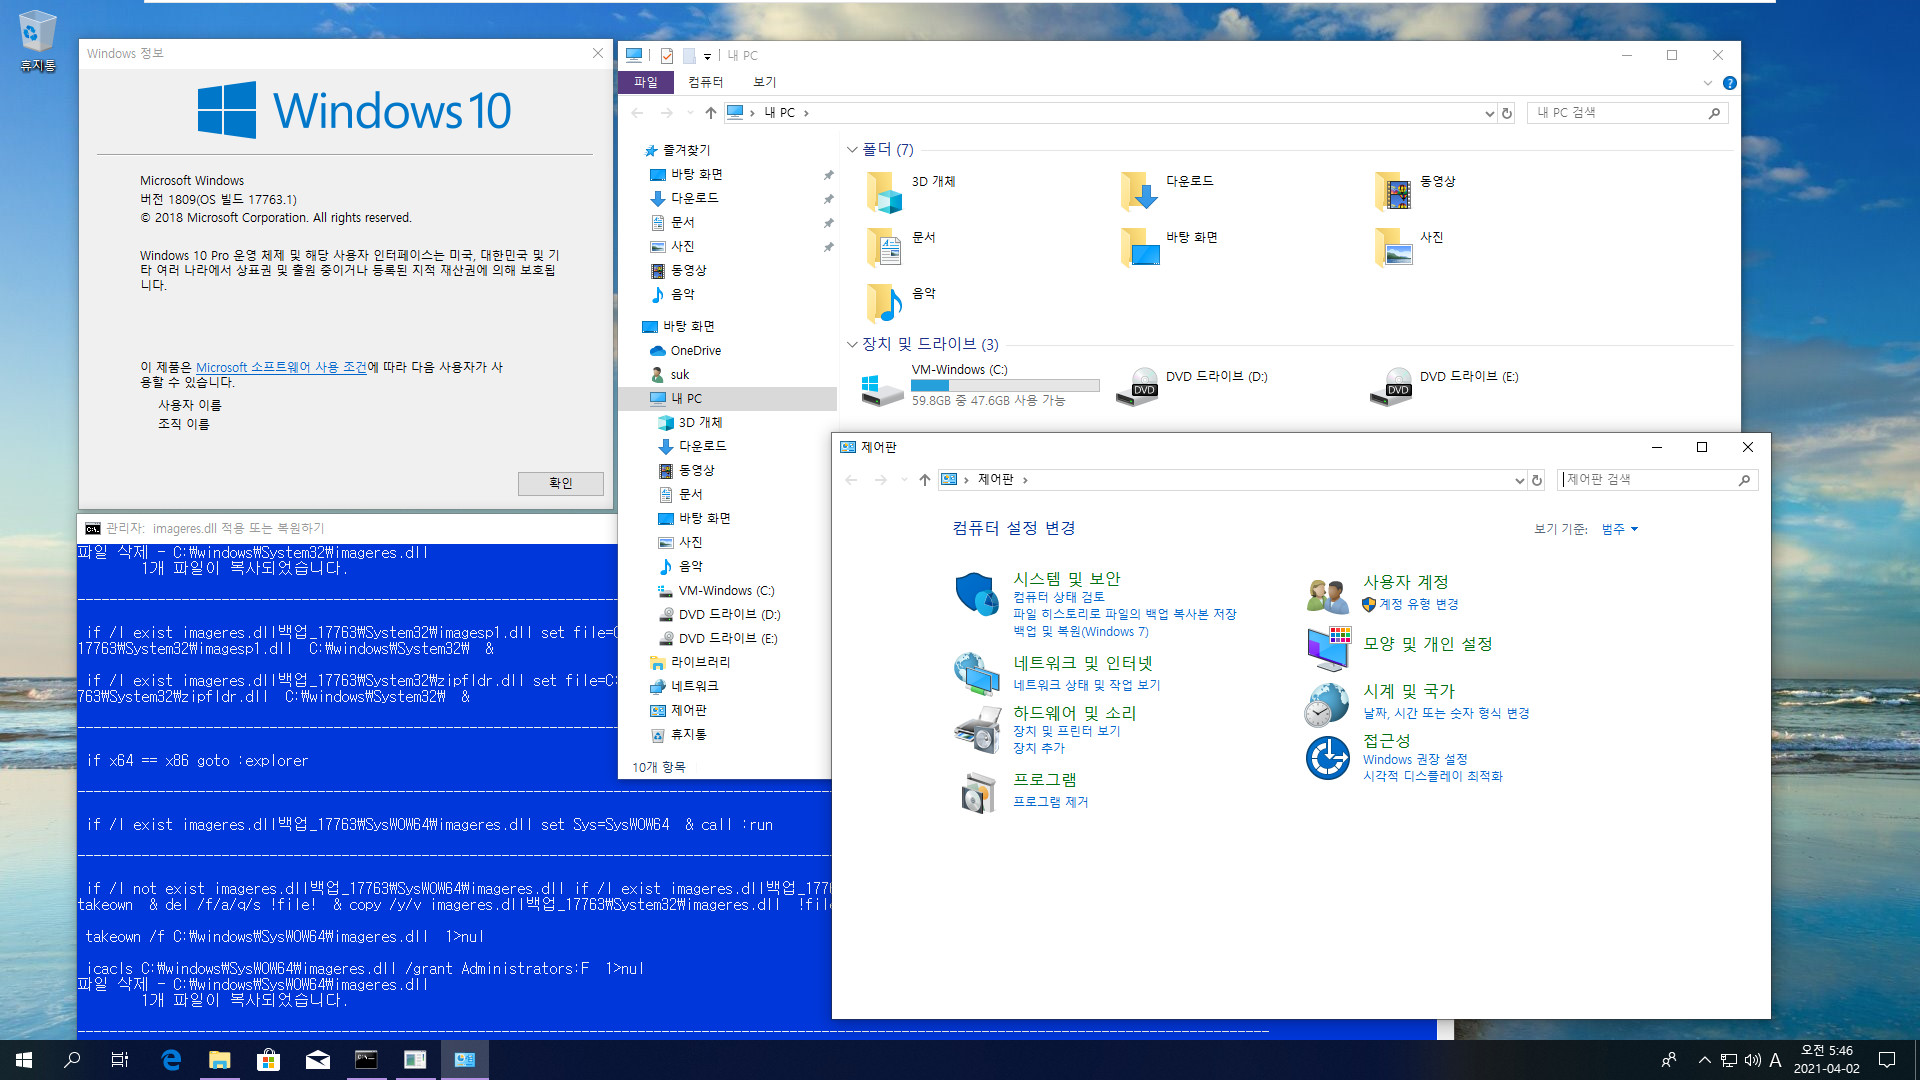 imageres.dll 적용하면 부팅이 안 되는 윈도우는 imageres.dll 2개를 합치면 부팅 됩니다 2021-04-02_054610.jpg